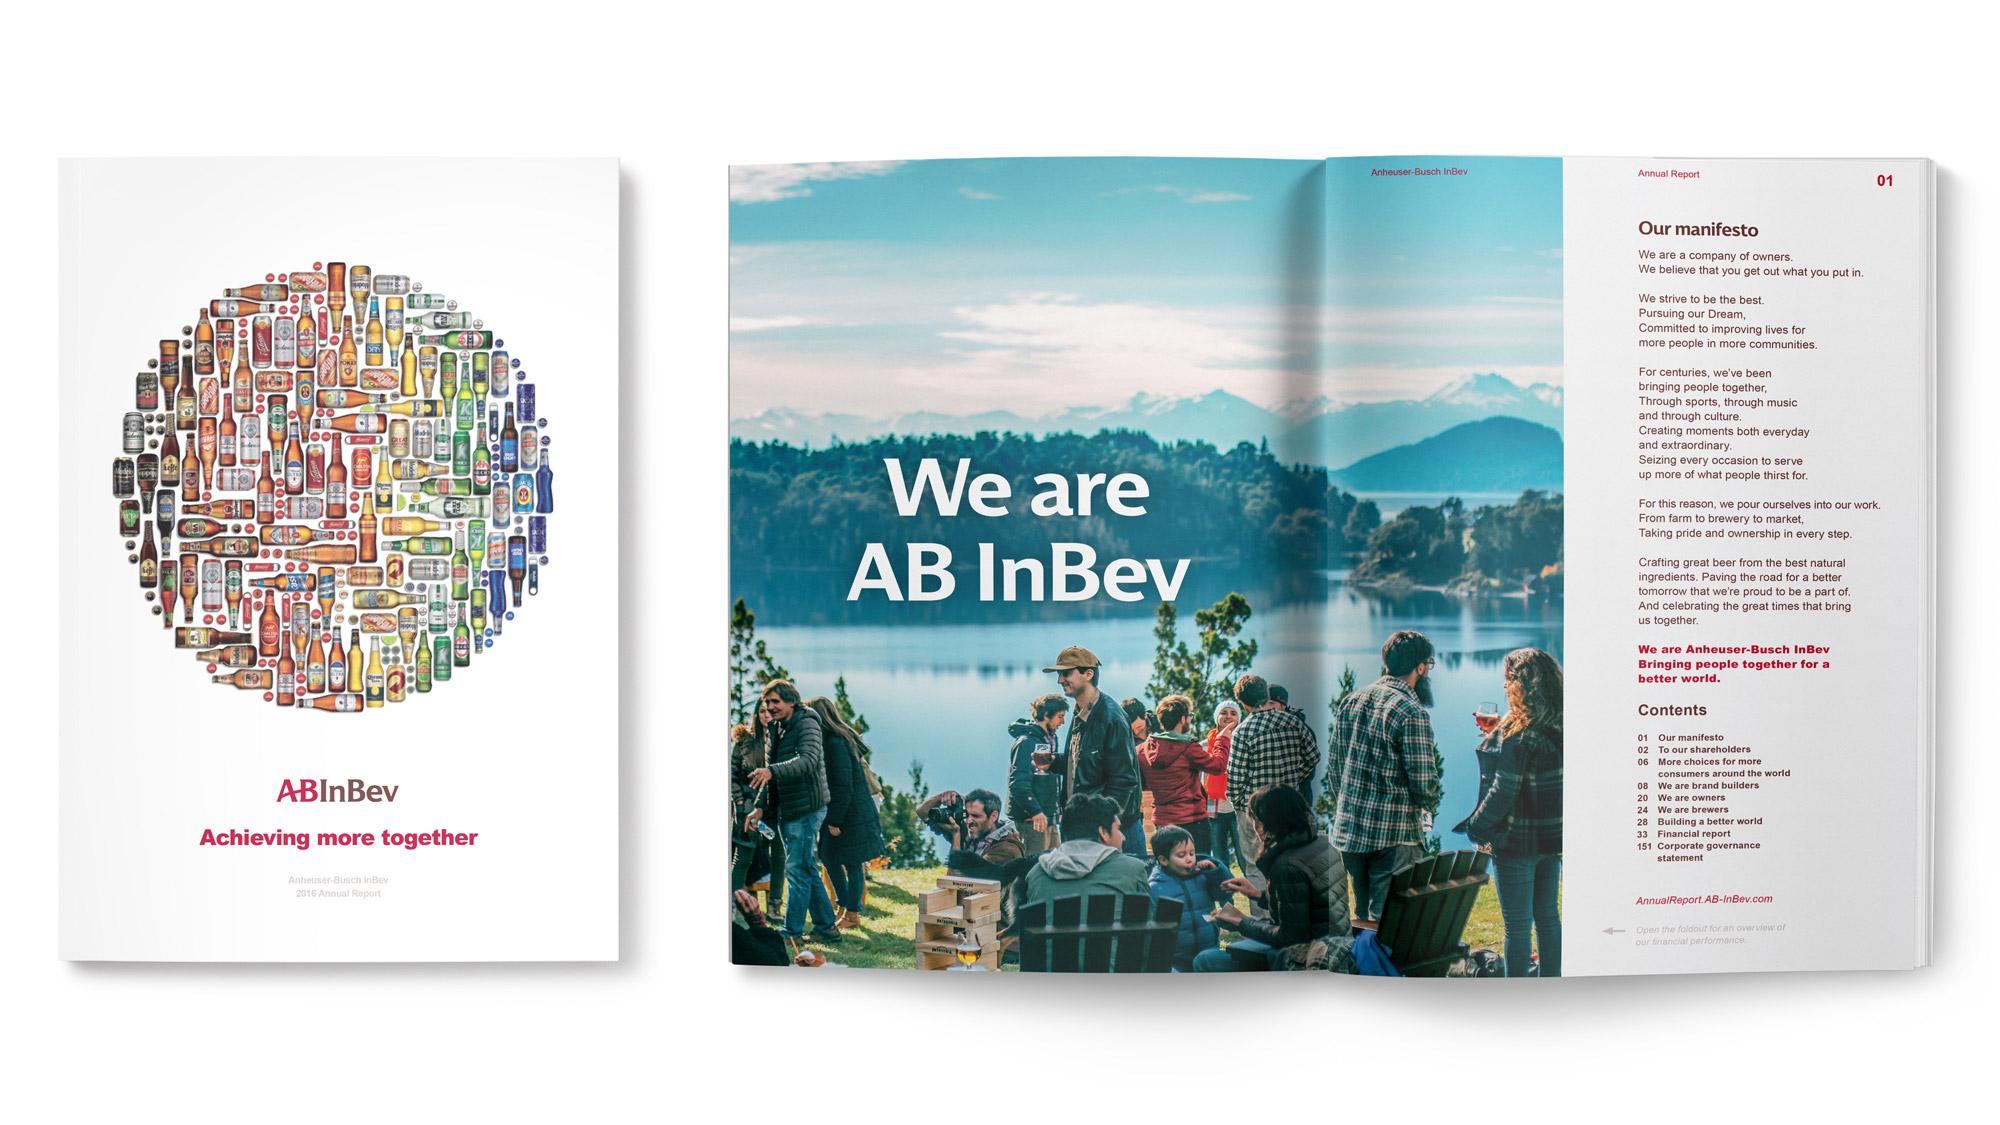 ABI_book1.jpg